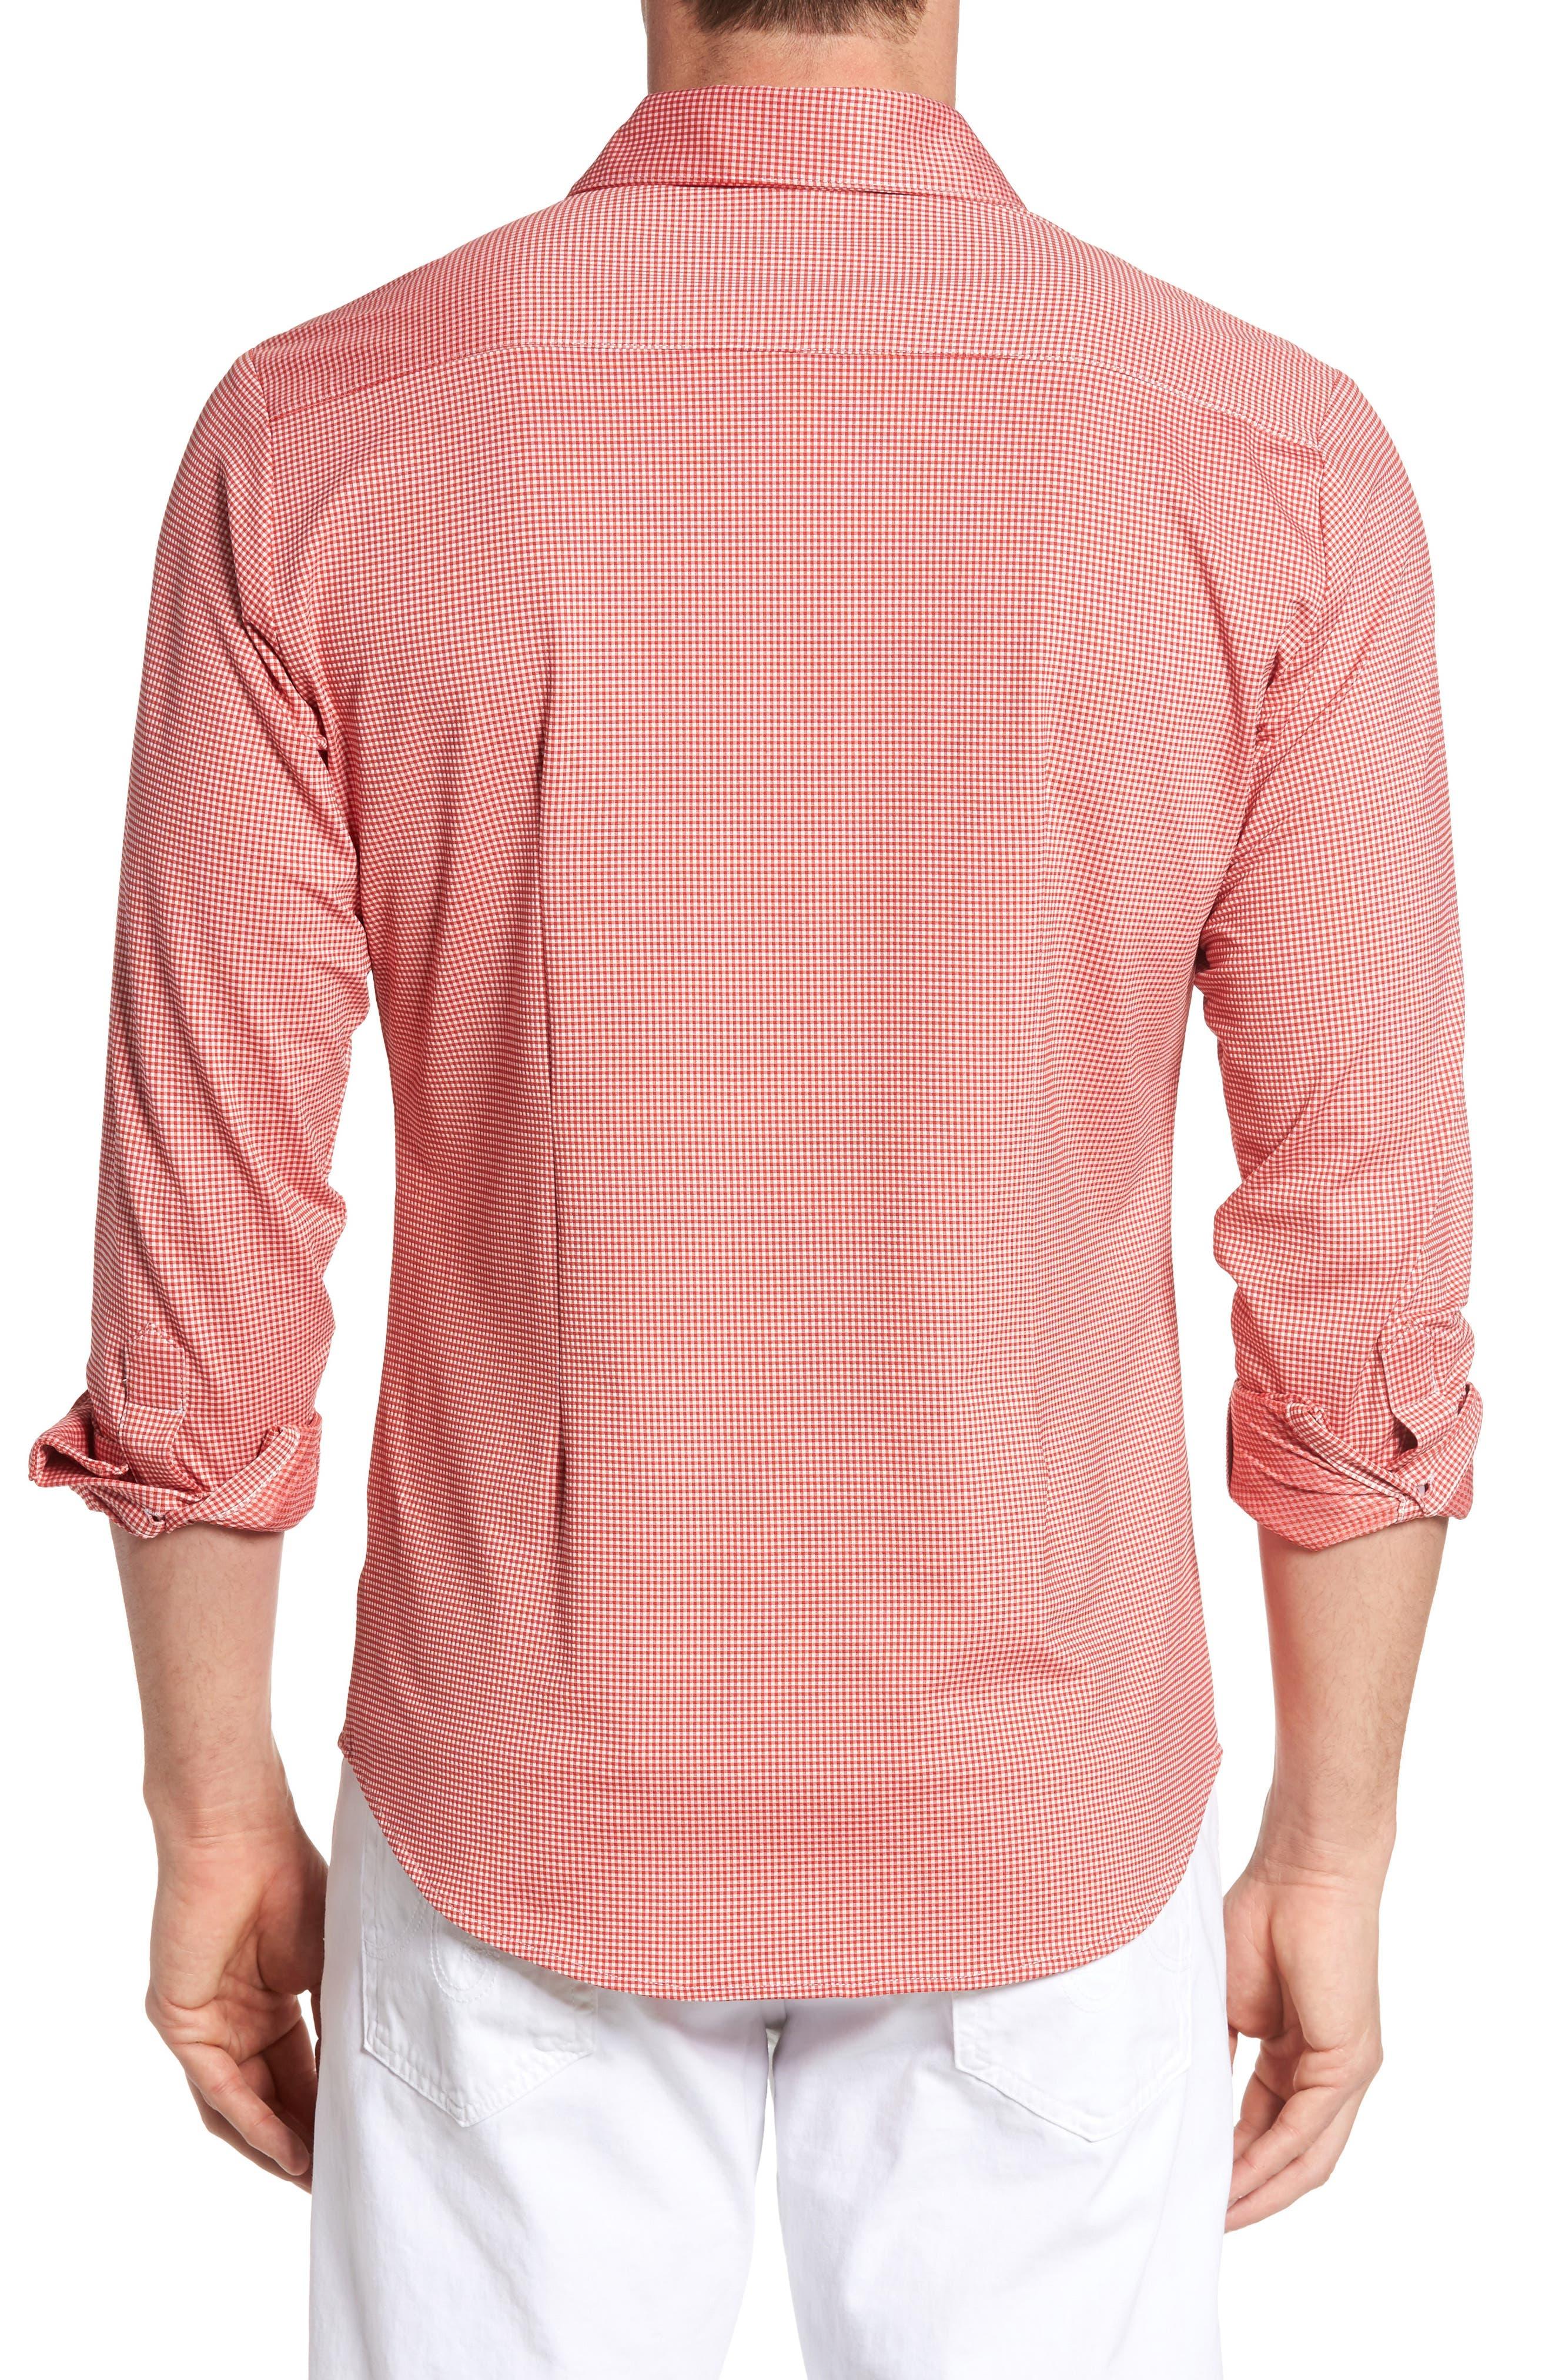 MIZZEN+MAIN,                             Hawthorne Gingham Sport Shirt,                             Alternate thumbnail 2, color,                             600